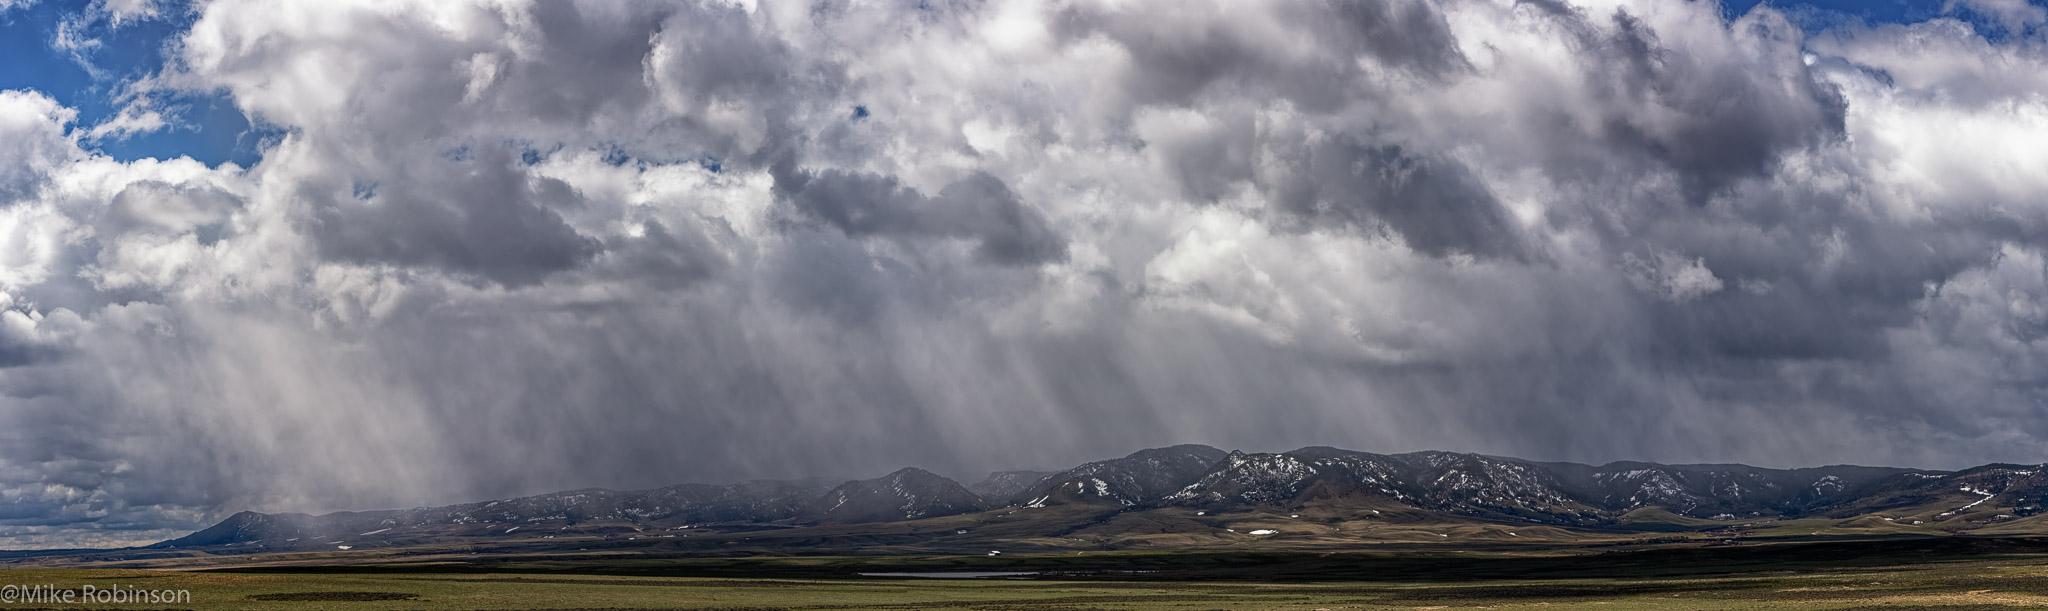 Shirley Mountains Showers.jpg